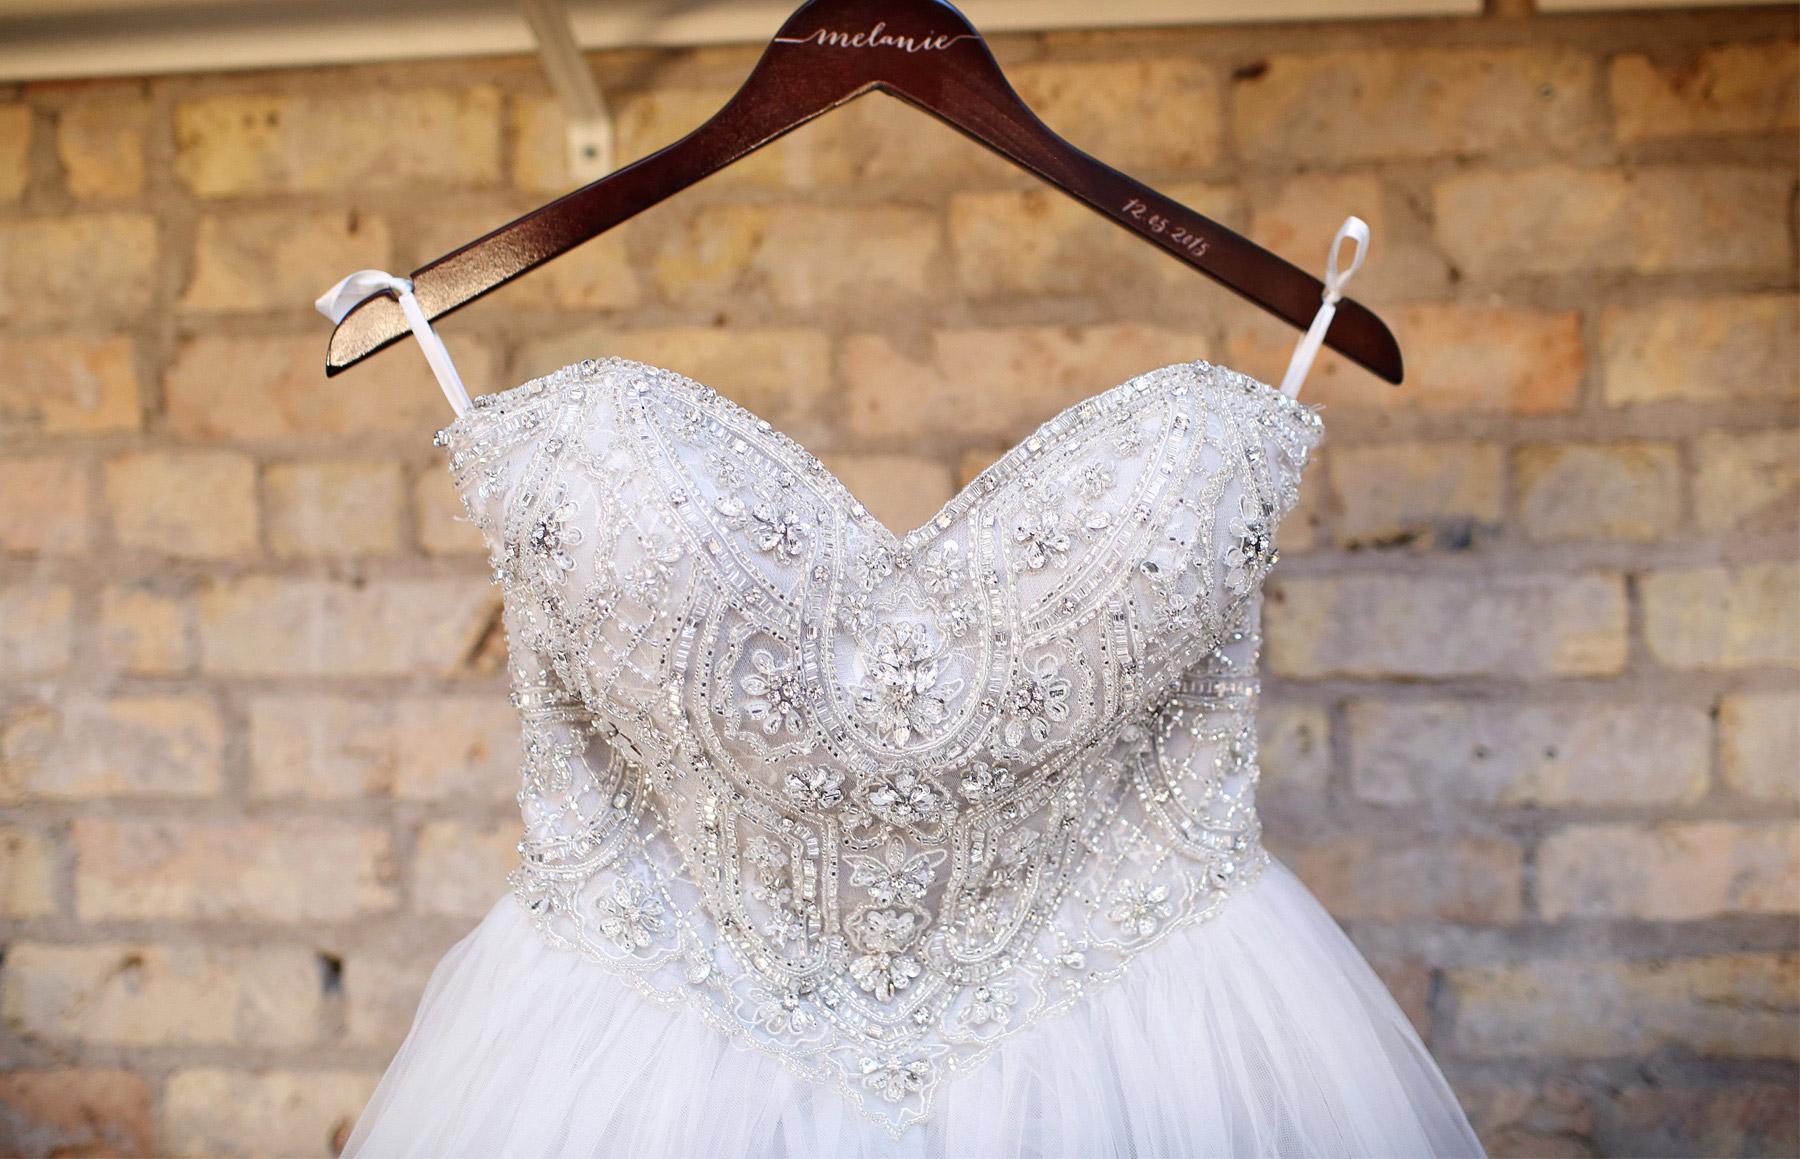 01-Minneapolis-Minnesota-Wedding-Photography-Aria-Downtown-Industrial-Bride-Dress-Melanie-and-Andrew.jpg